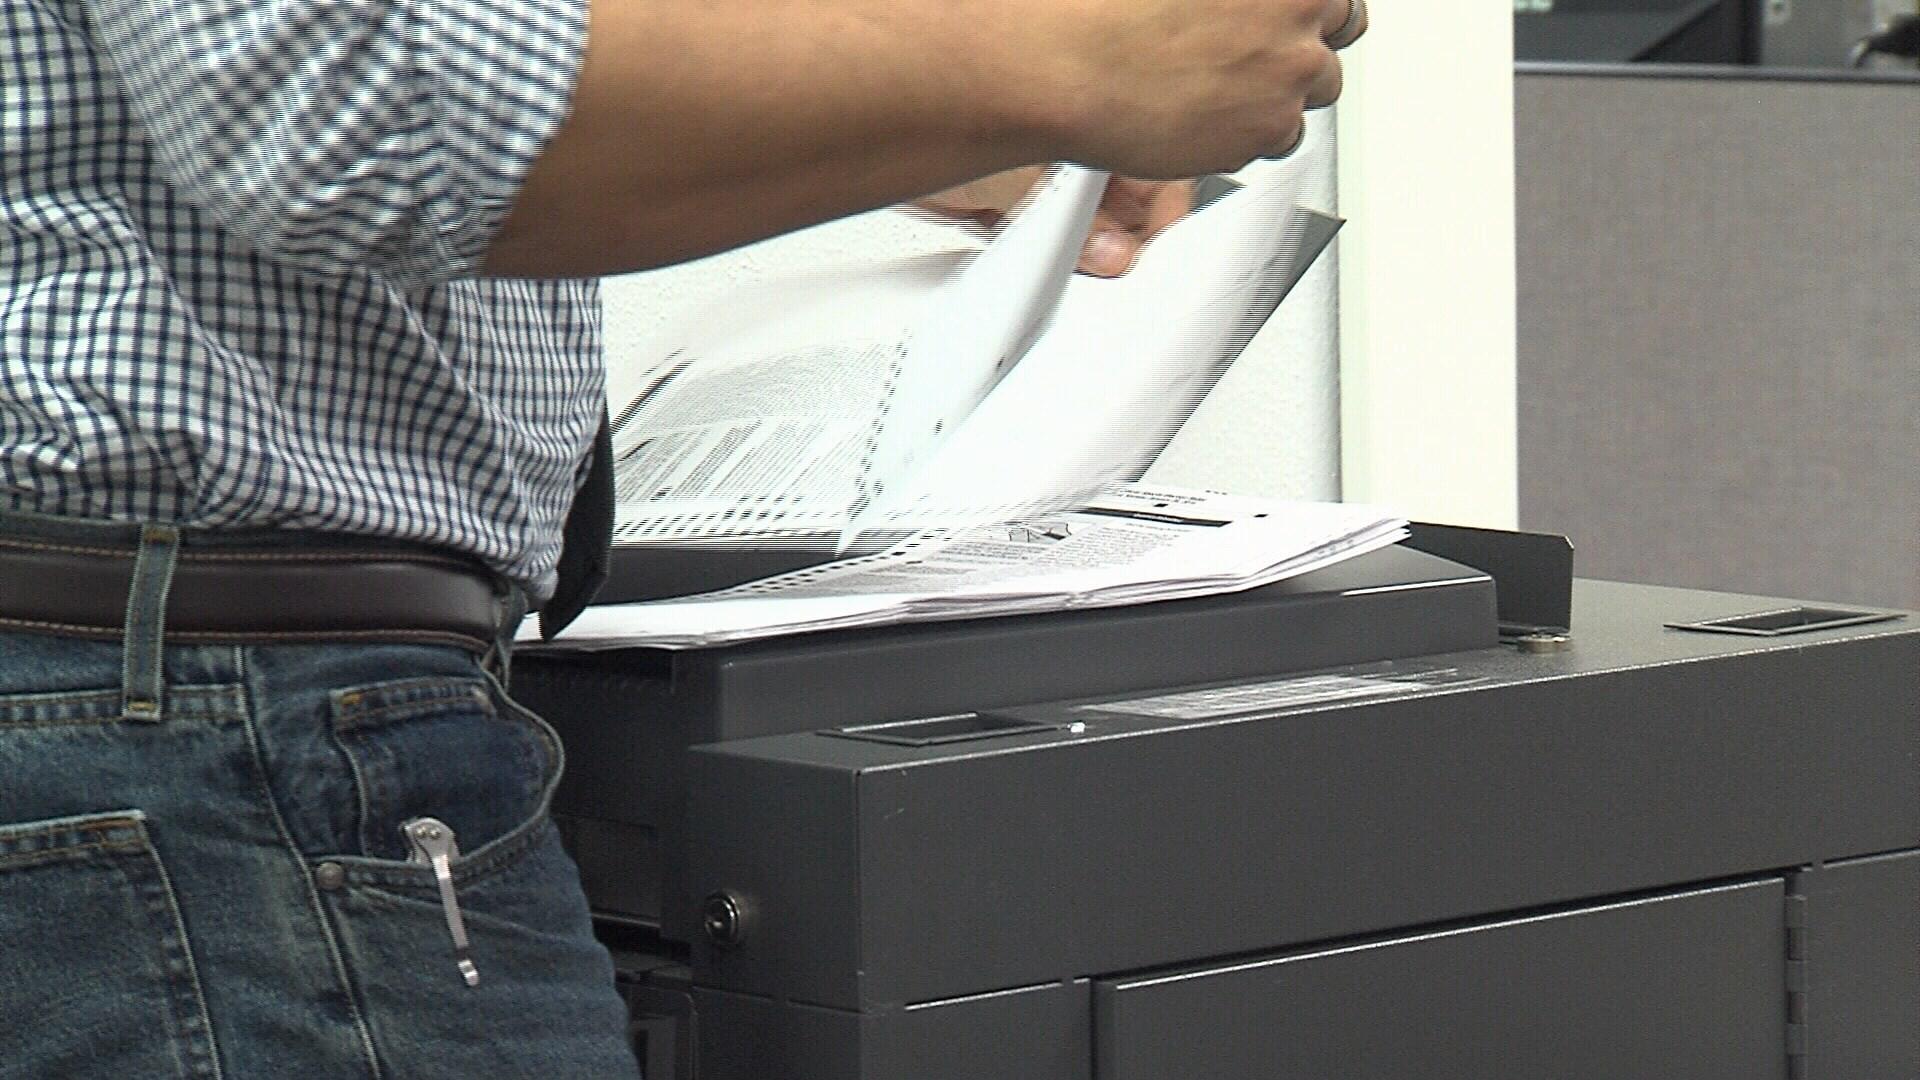 ballot machine